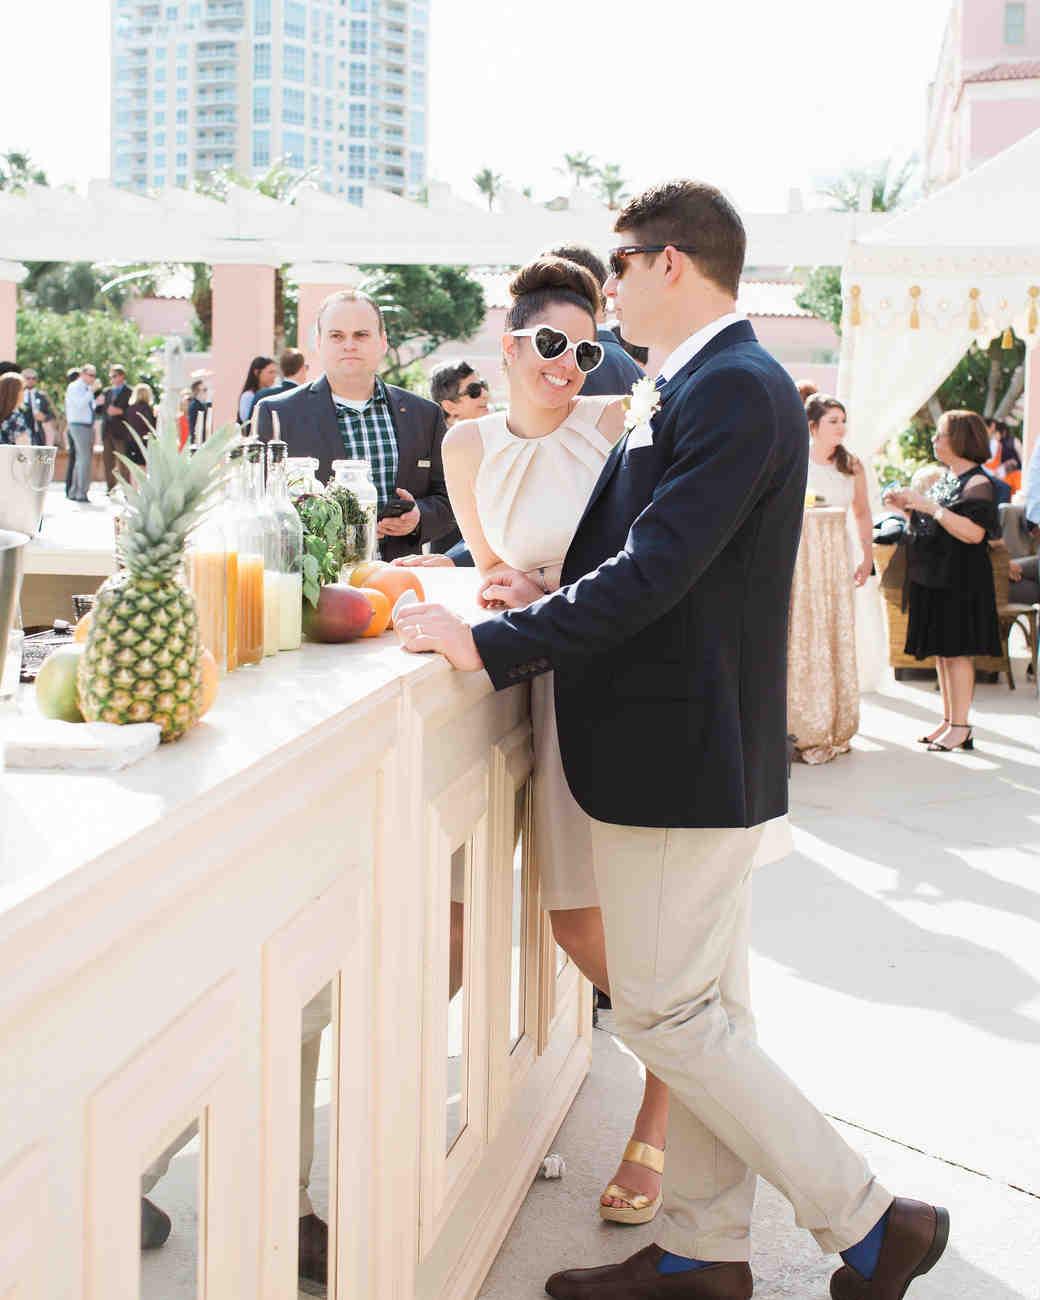 Guests at the Bar at an Outdoor Wedding